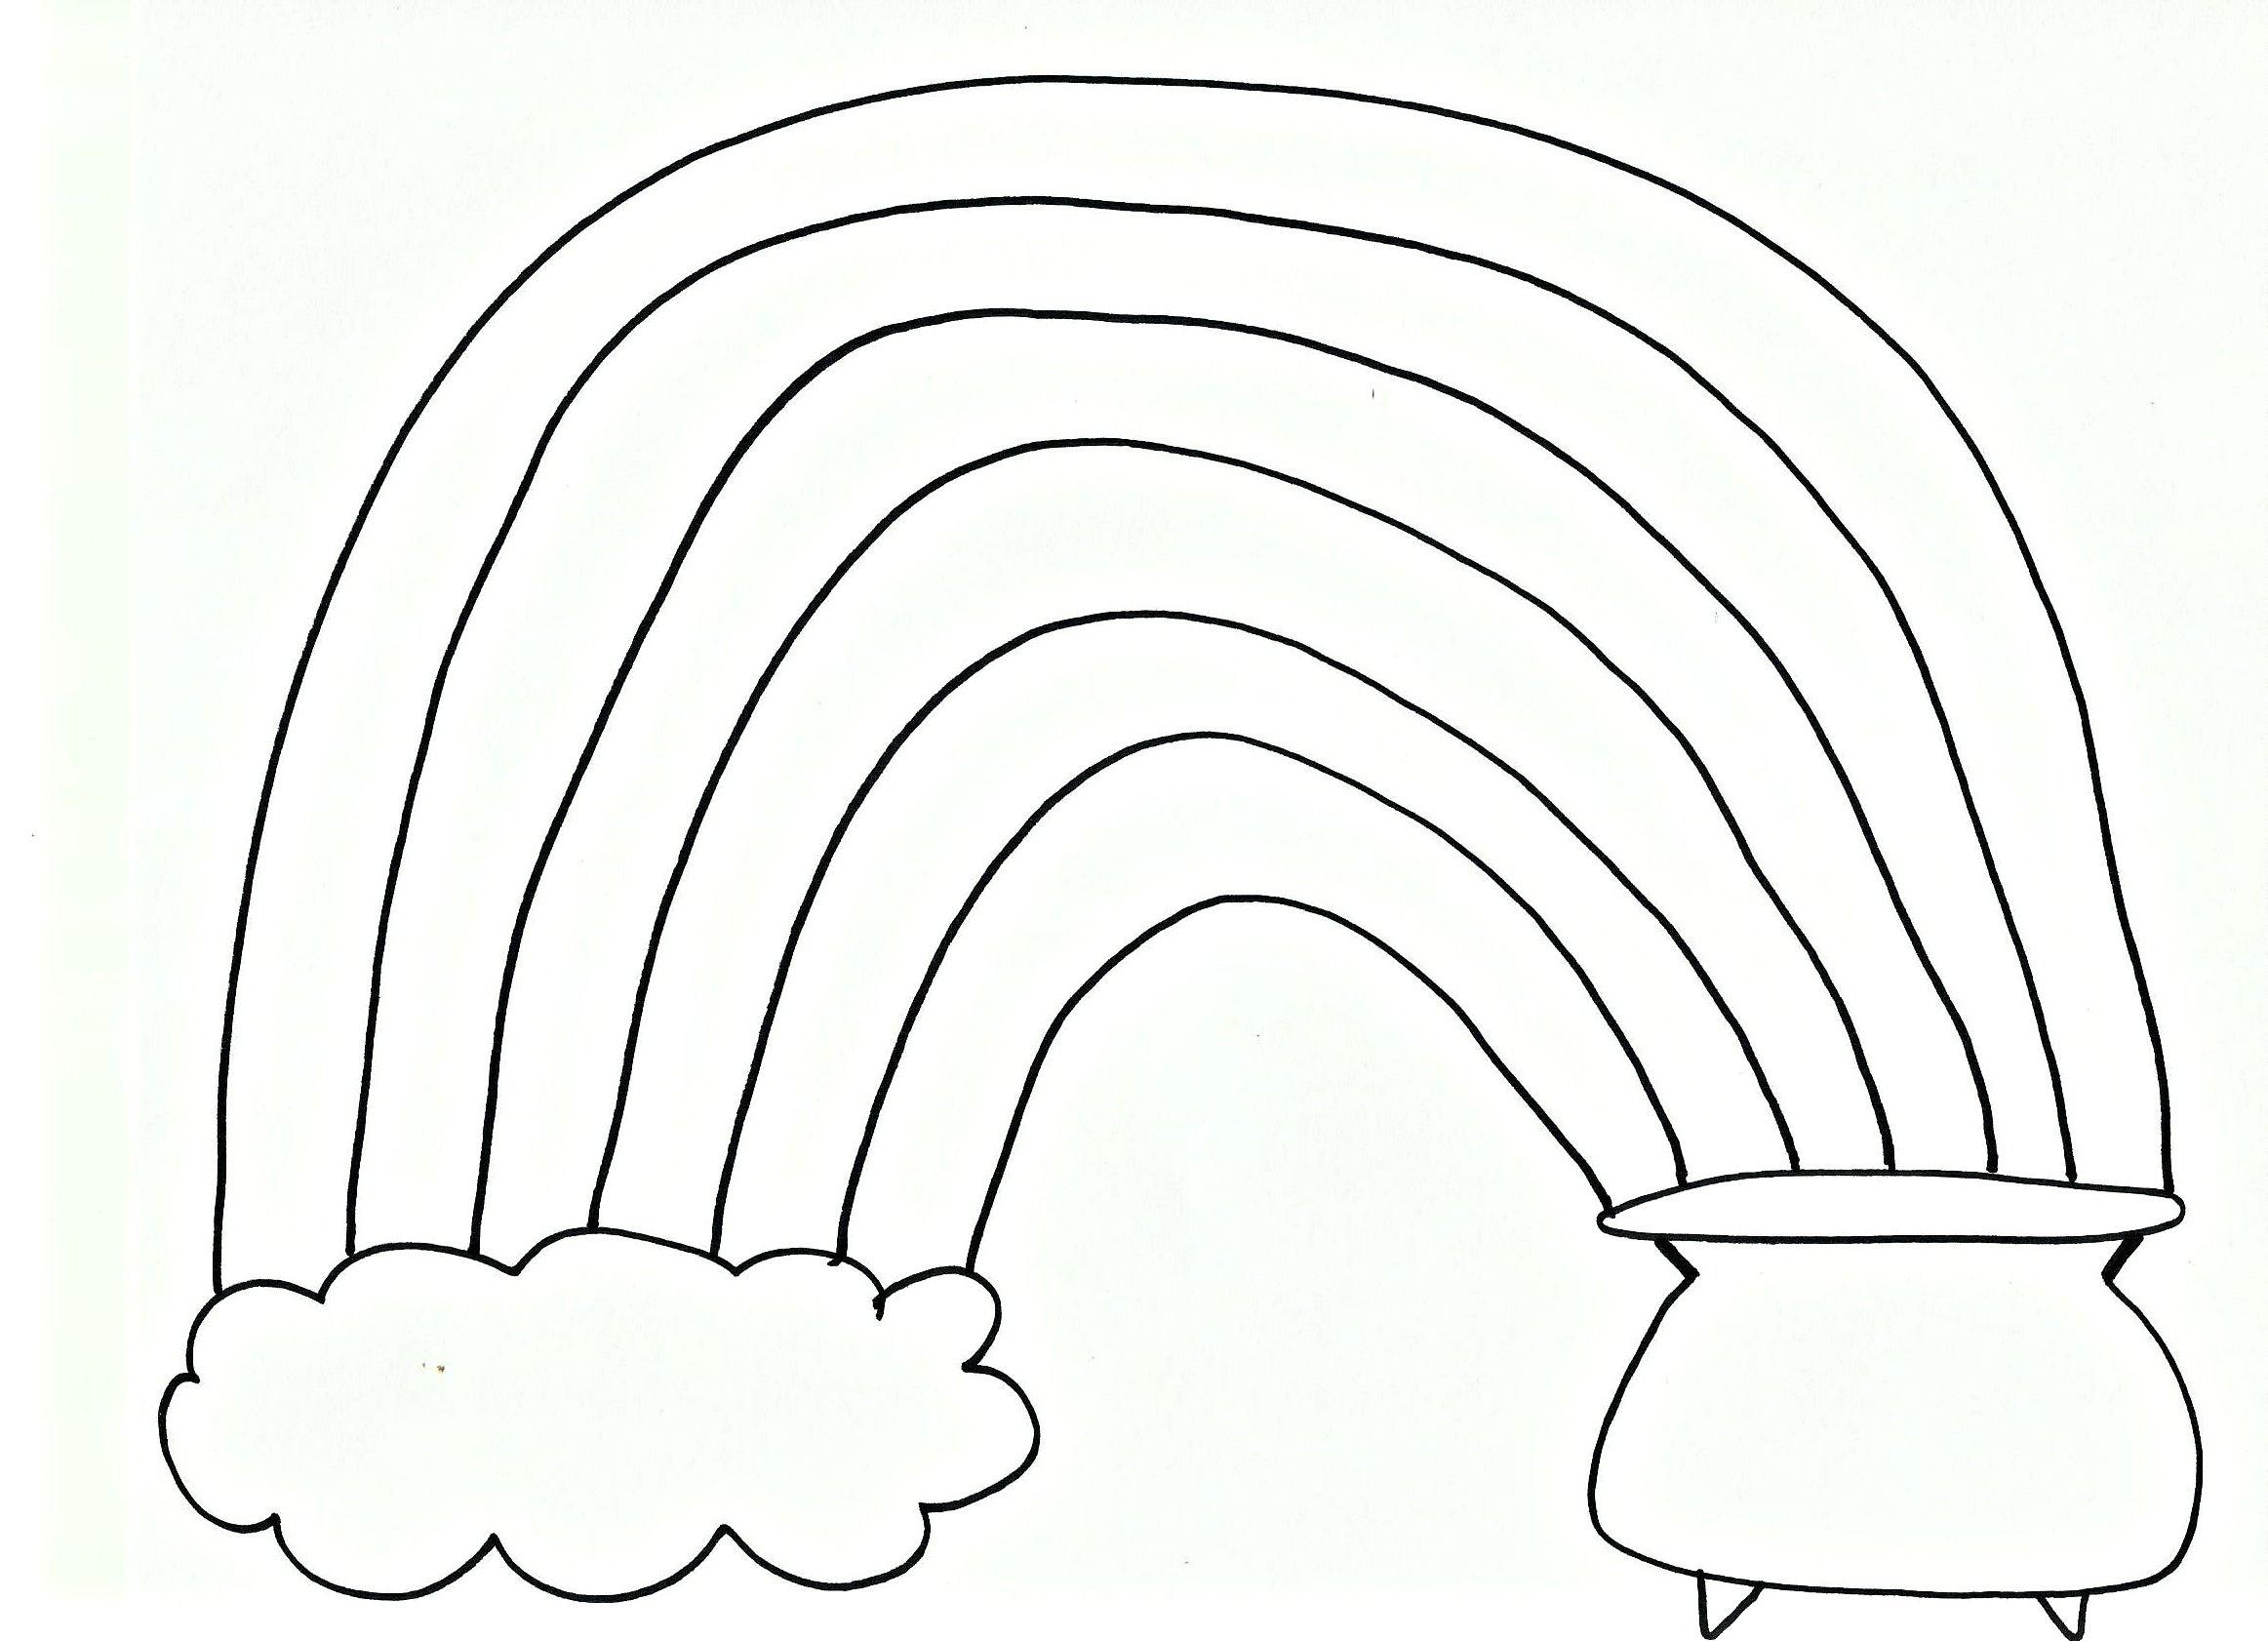 Pom Pom Rainbow Craft For St Patrick S Day Free Printable